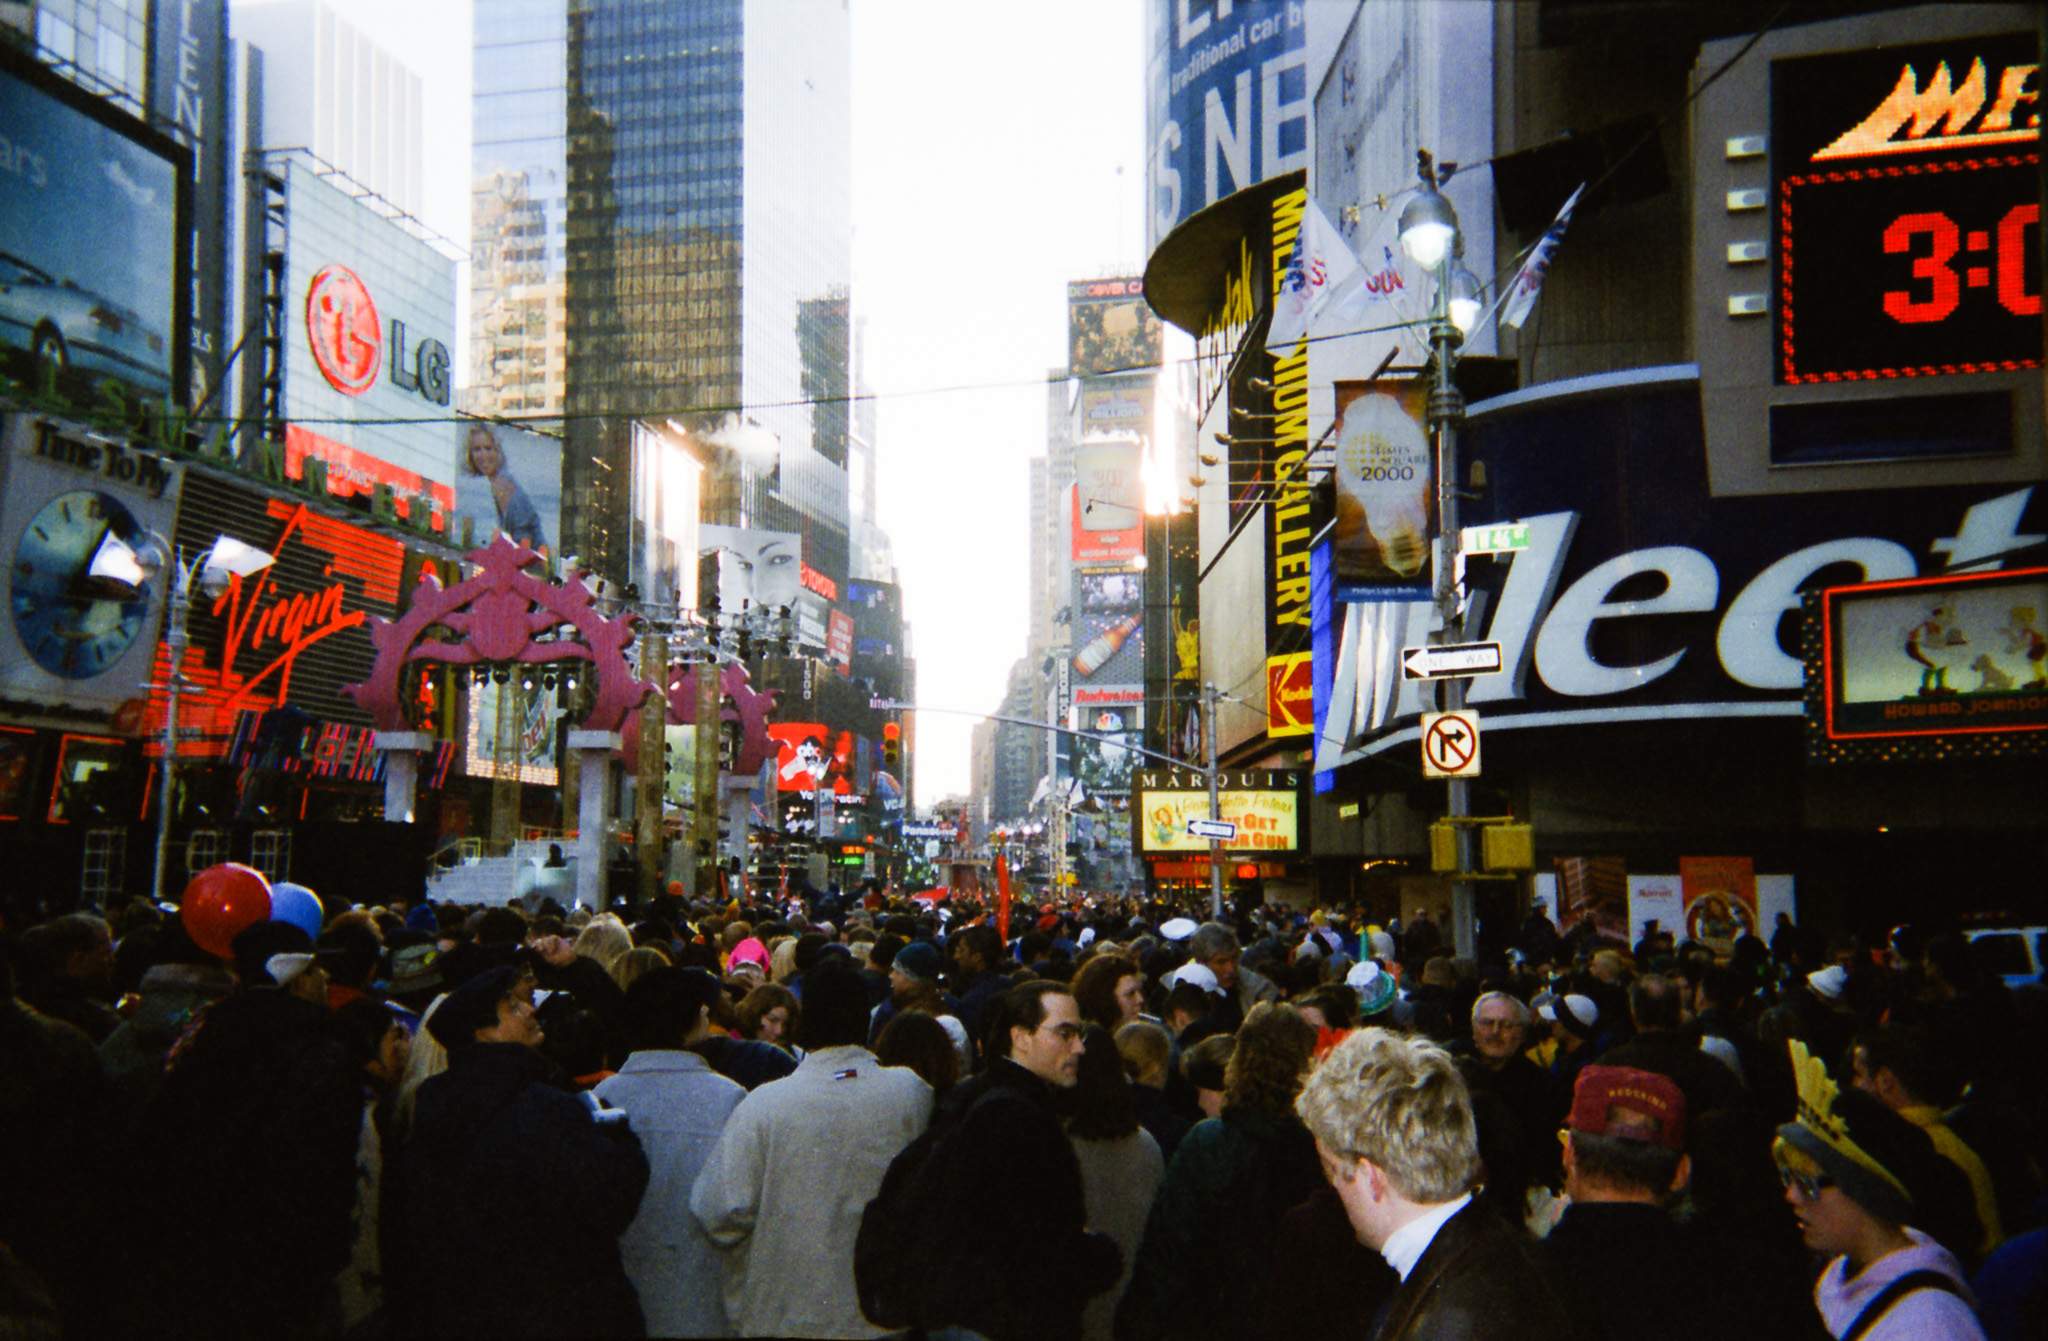 NYC-1999-084.jpg